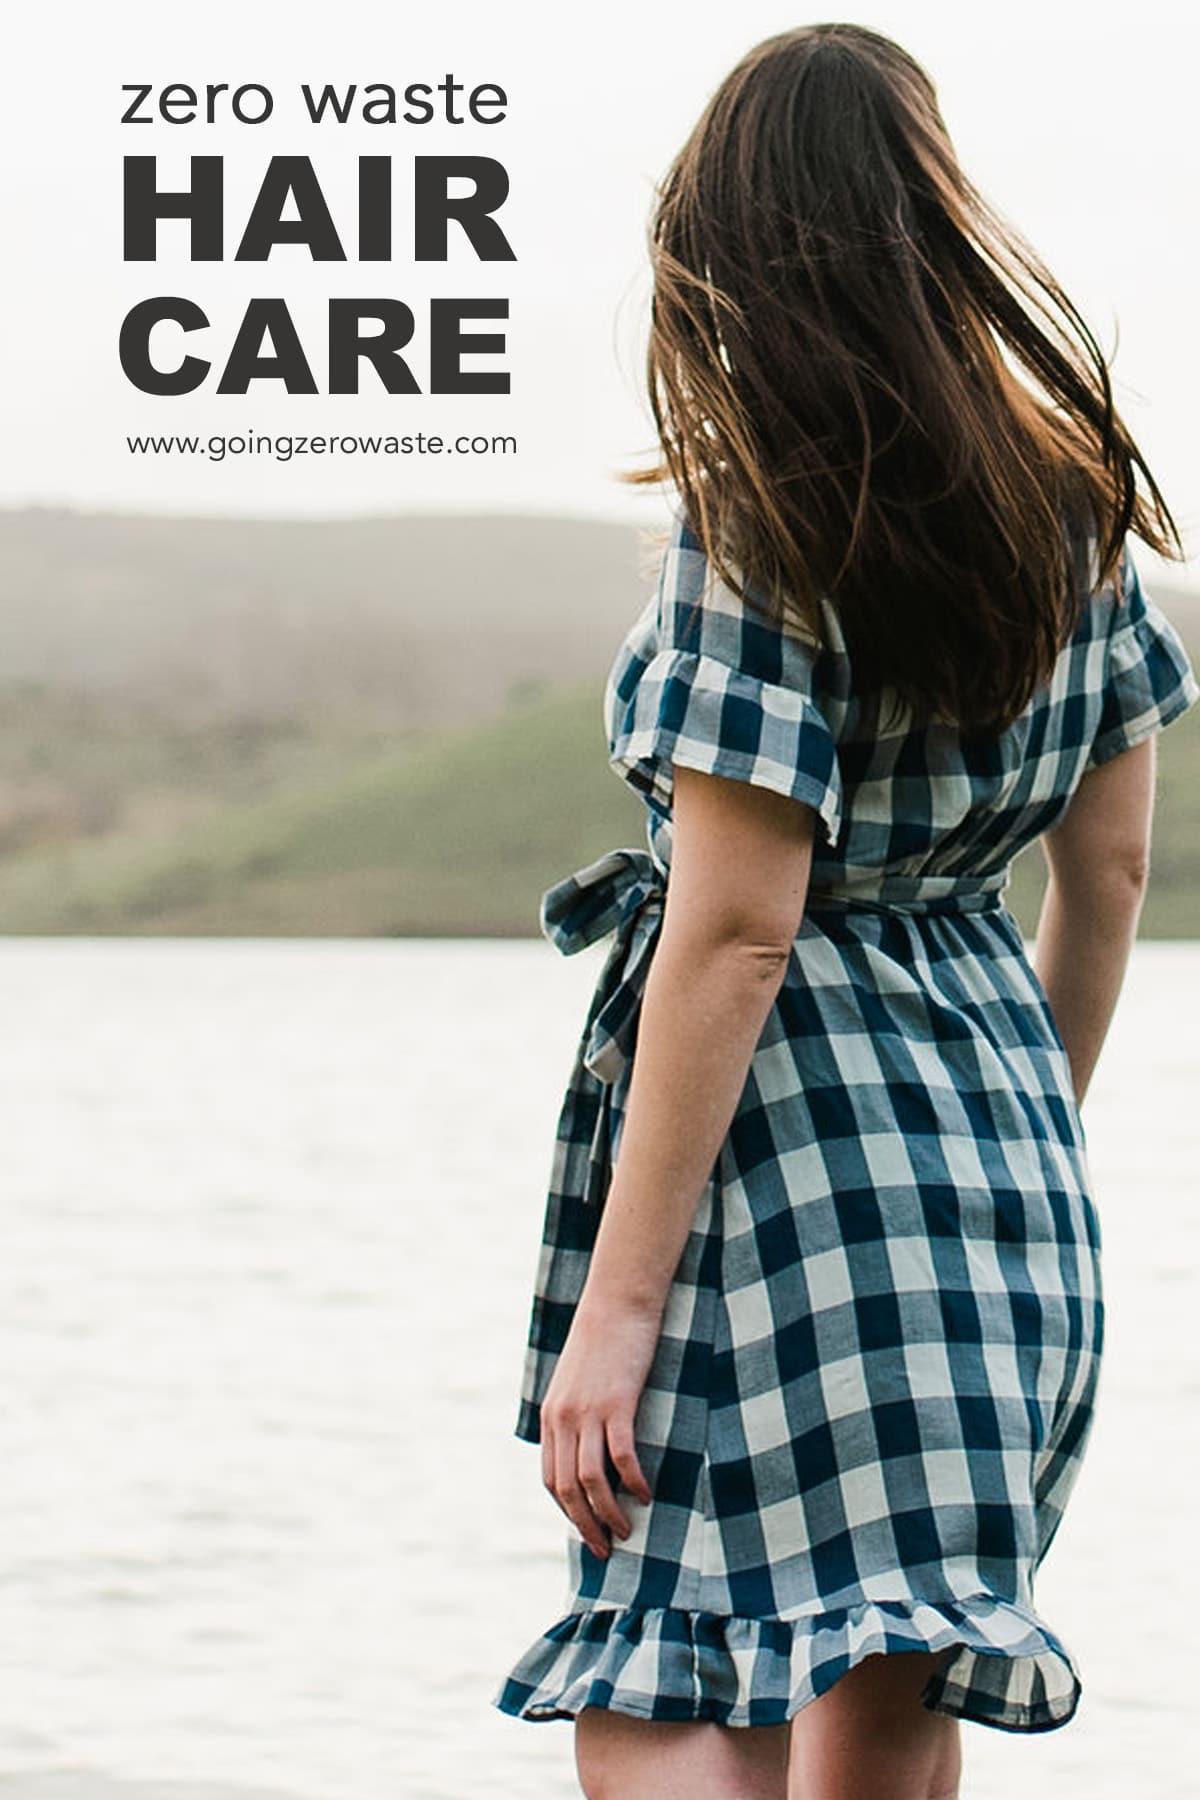 Zero Waste Hair Care from www.goingzerowaste.com #zerowaste #ecofriendly #gogreen #sustainable #haircare #DIY #skincare #healthyhair